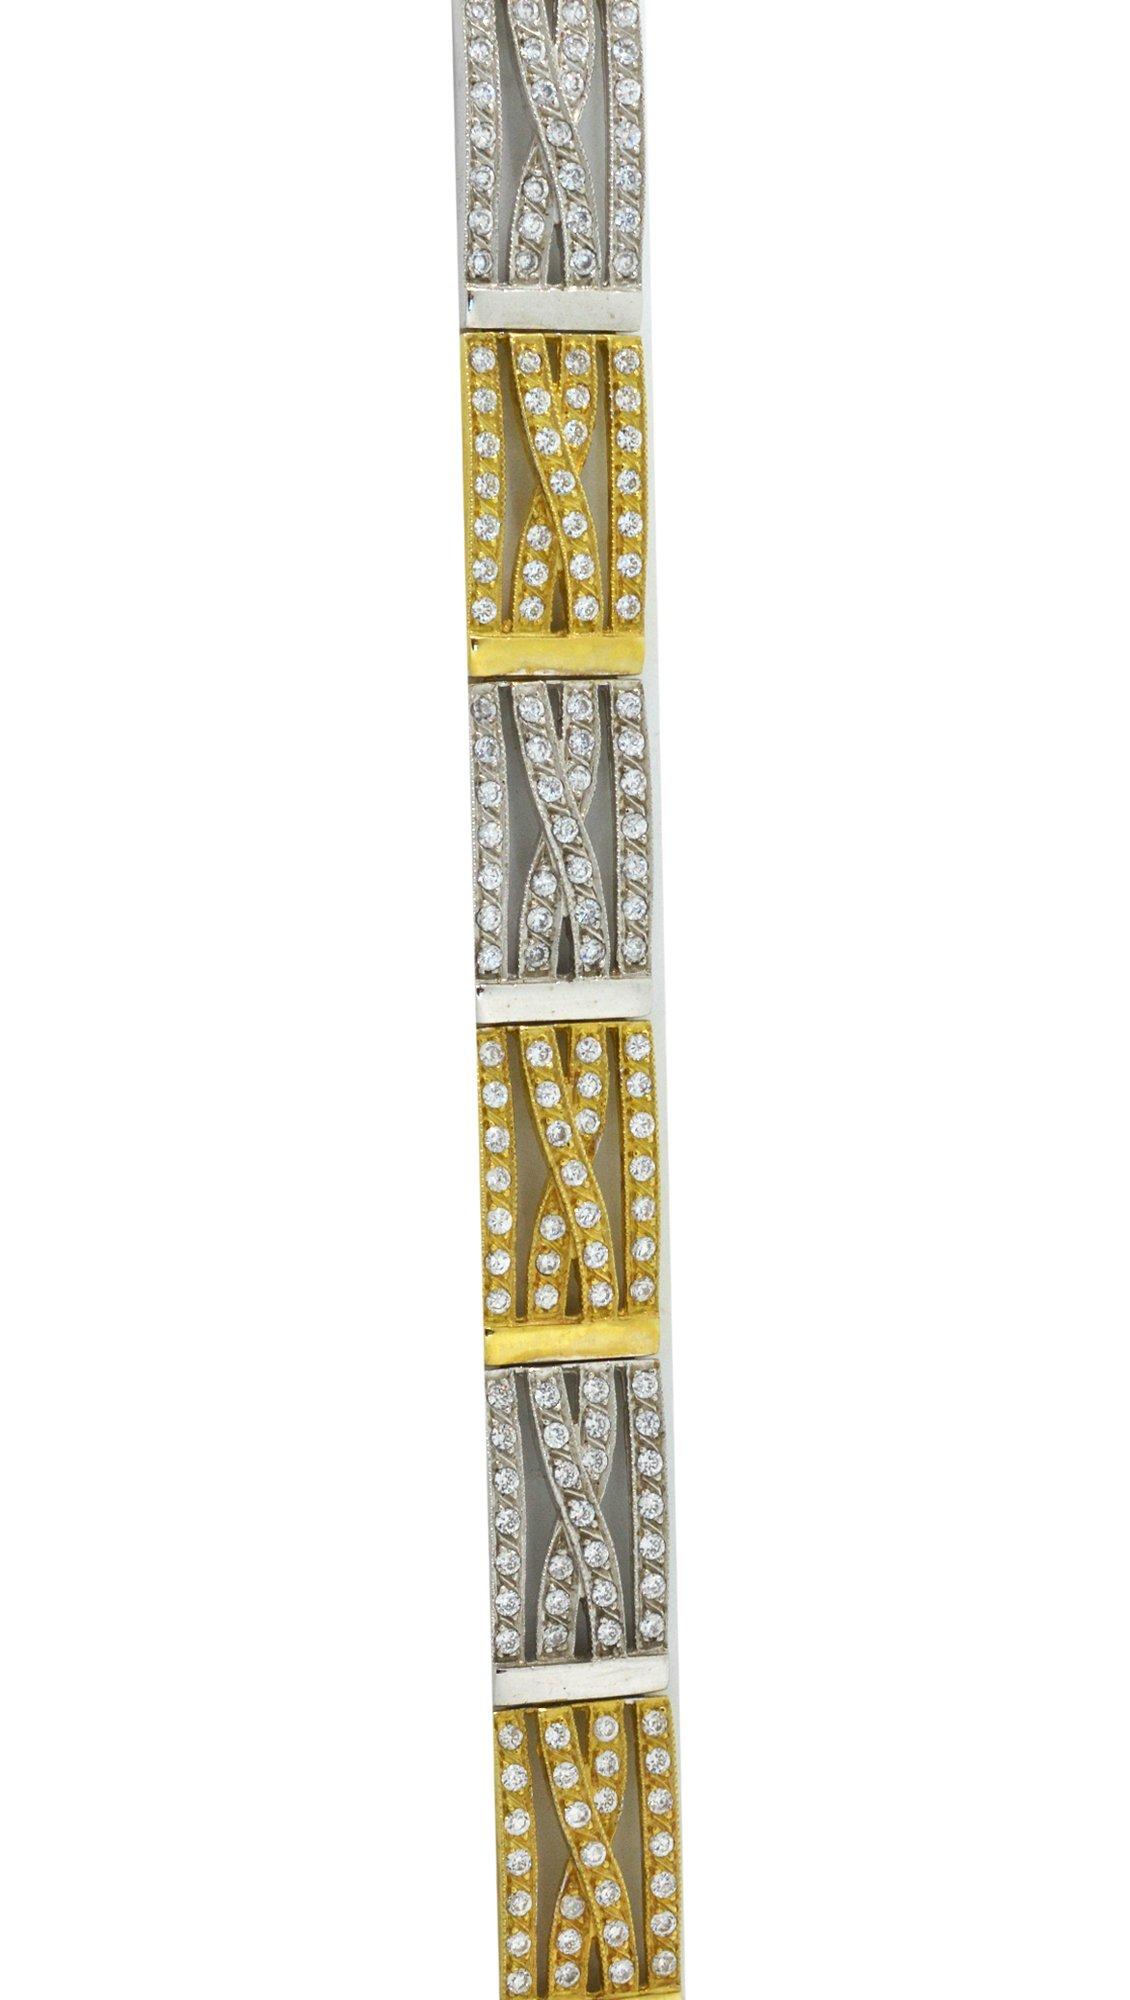 Watchmarket.gr Βραχιόλι σπαστή χειροπέδα με λευκόχρυσο και χρυσό 14 καράτια a5e9ce32101